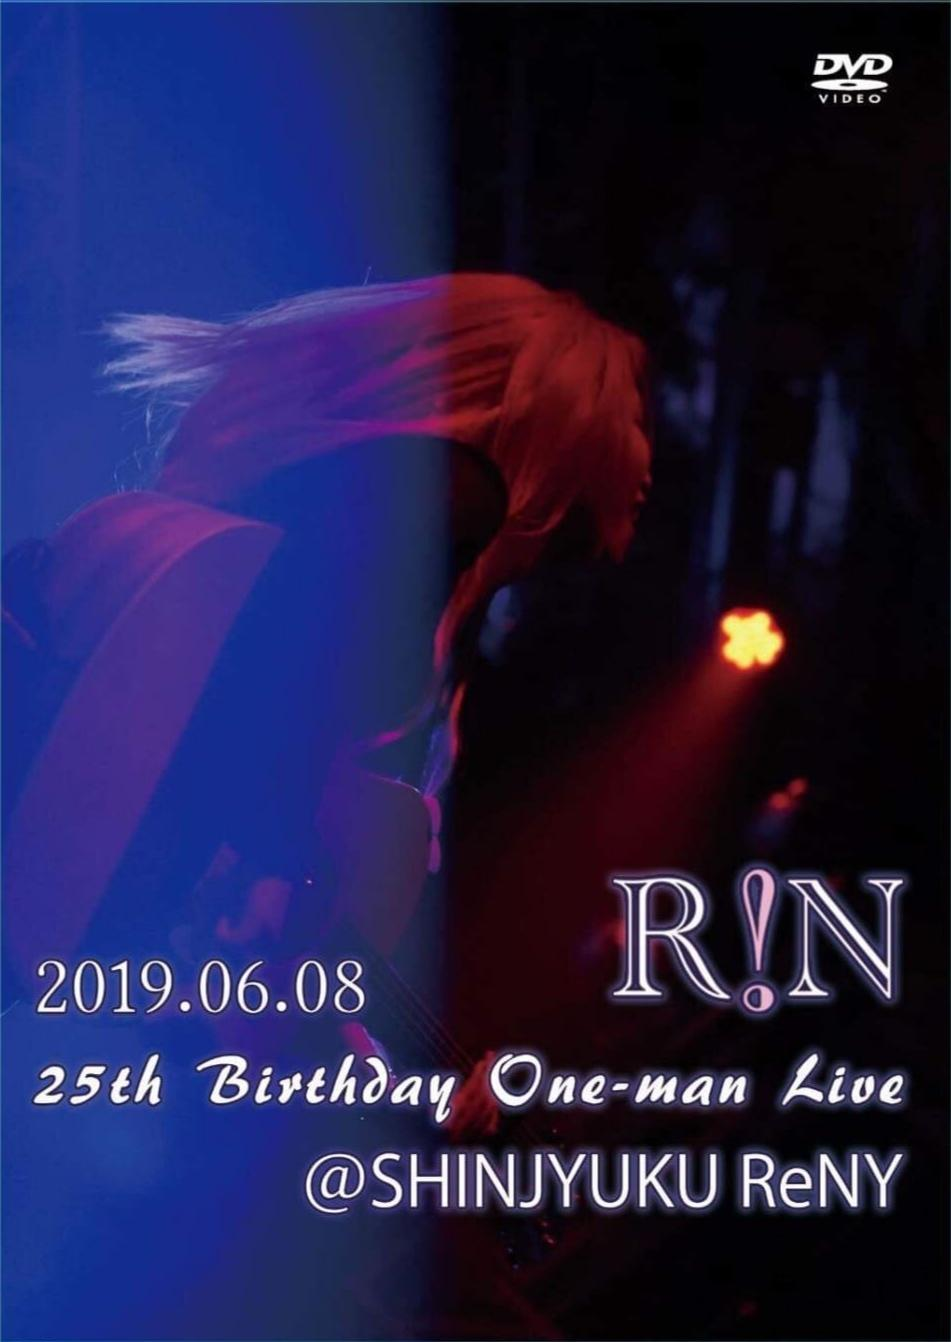 4th DVD「25th Bithday Oneman Live」@SHINJYUKU ReNY